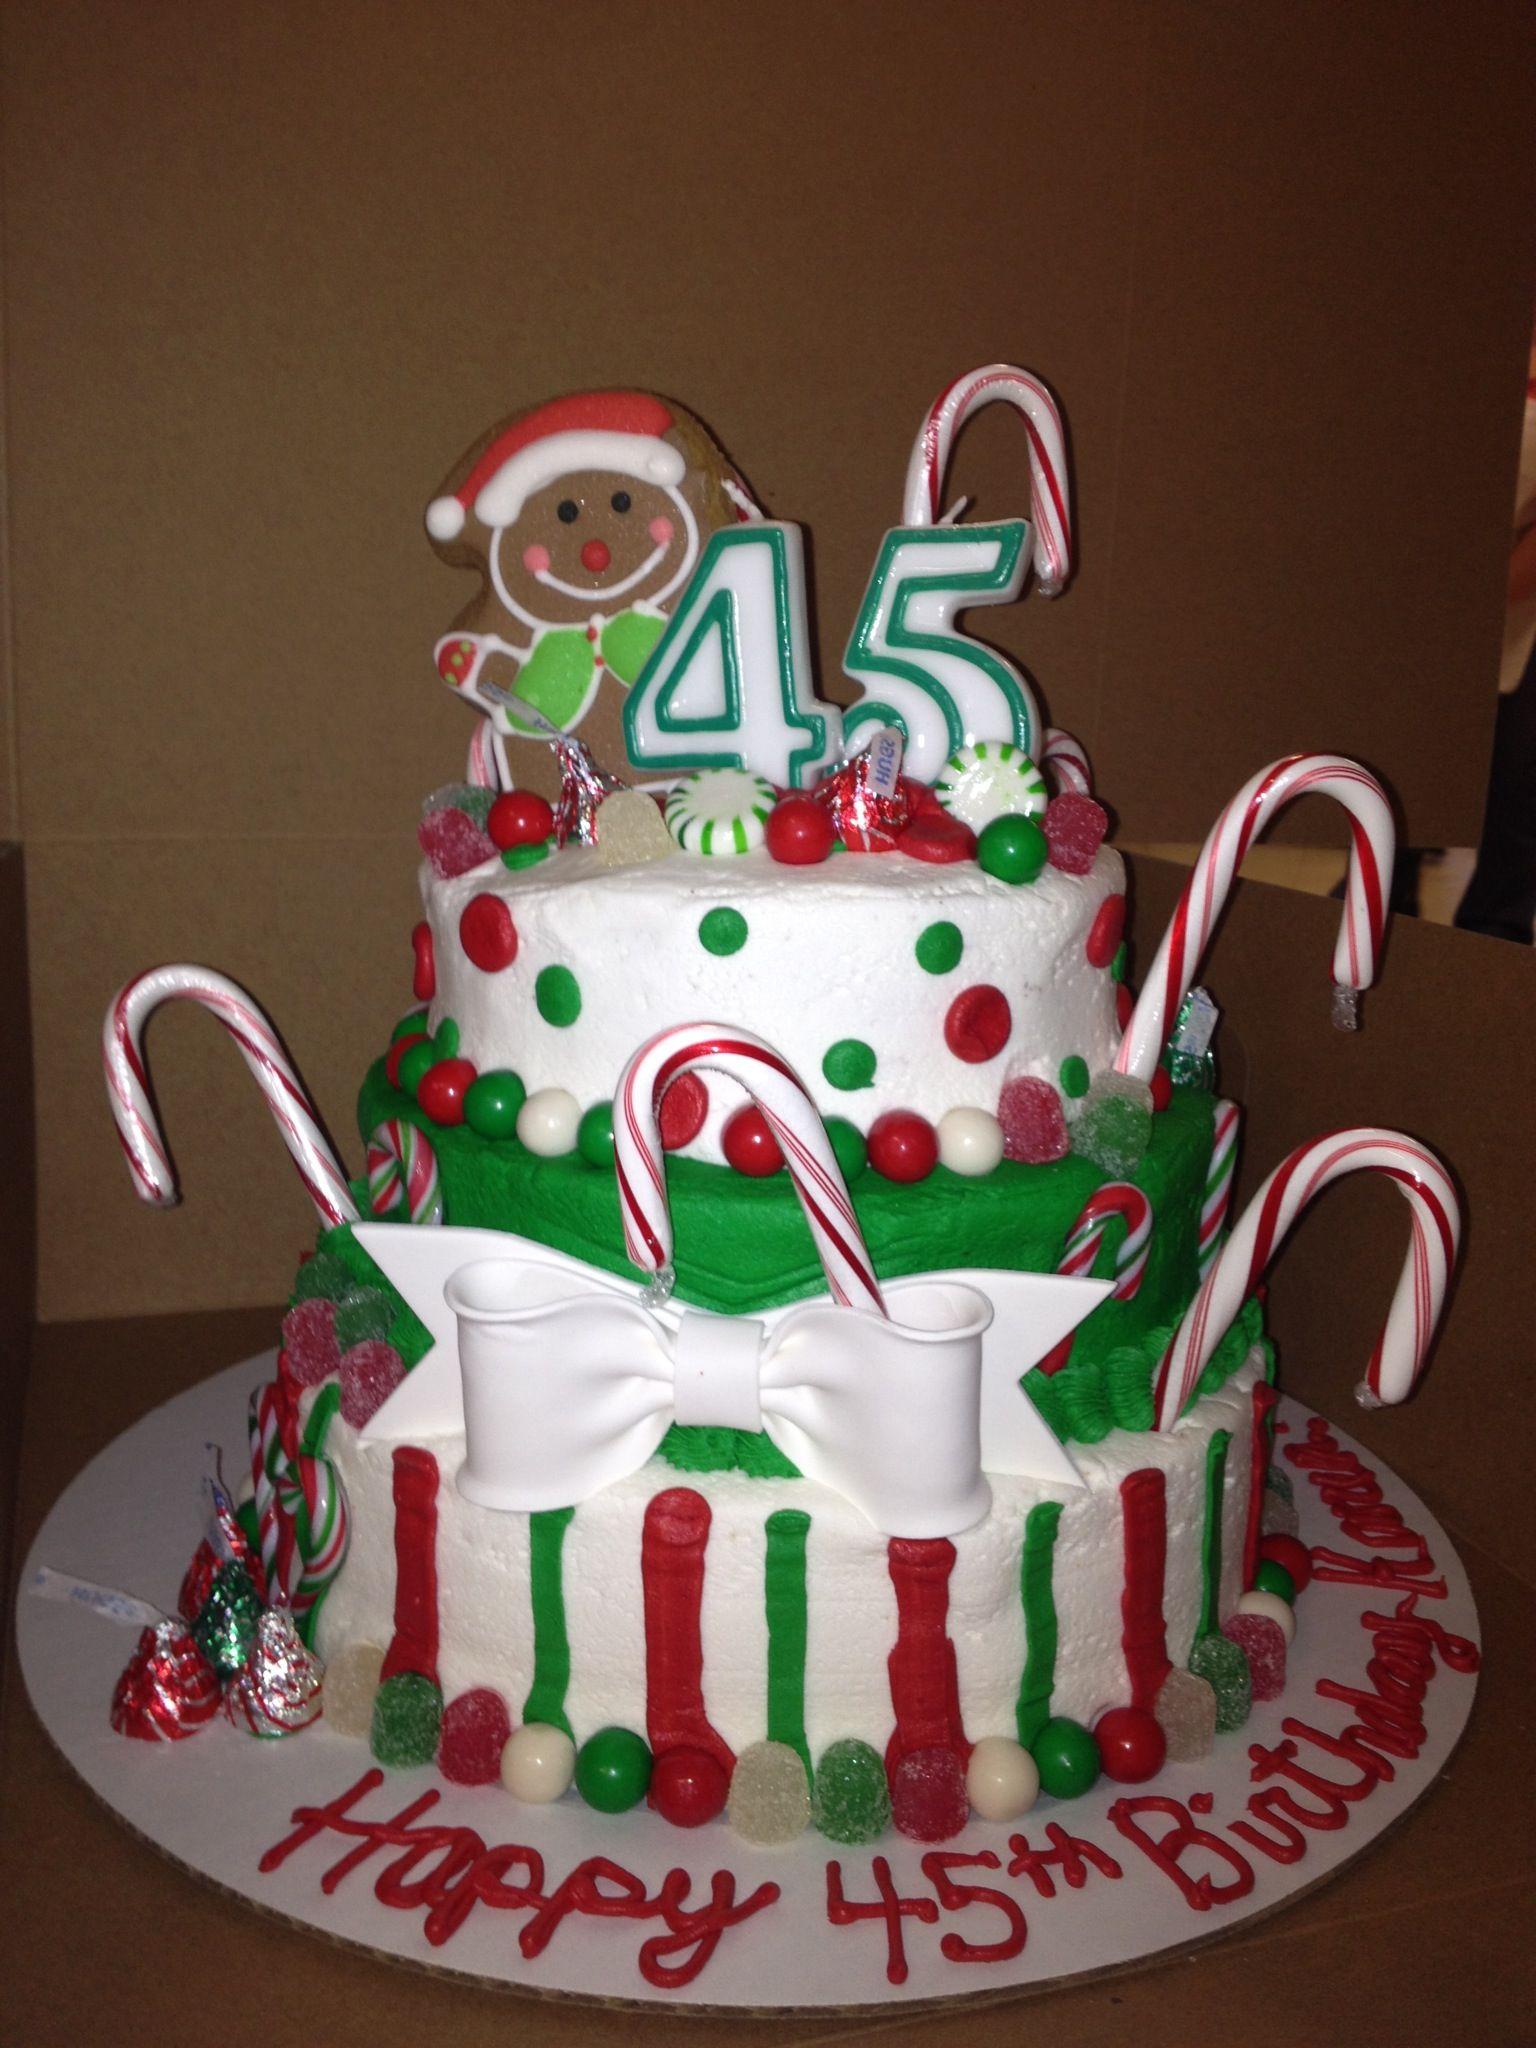 Christmas themed birthday cake. Do Dah's Donuts